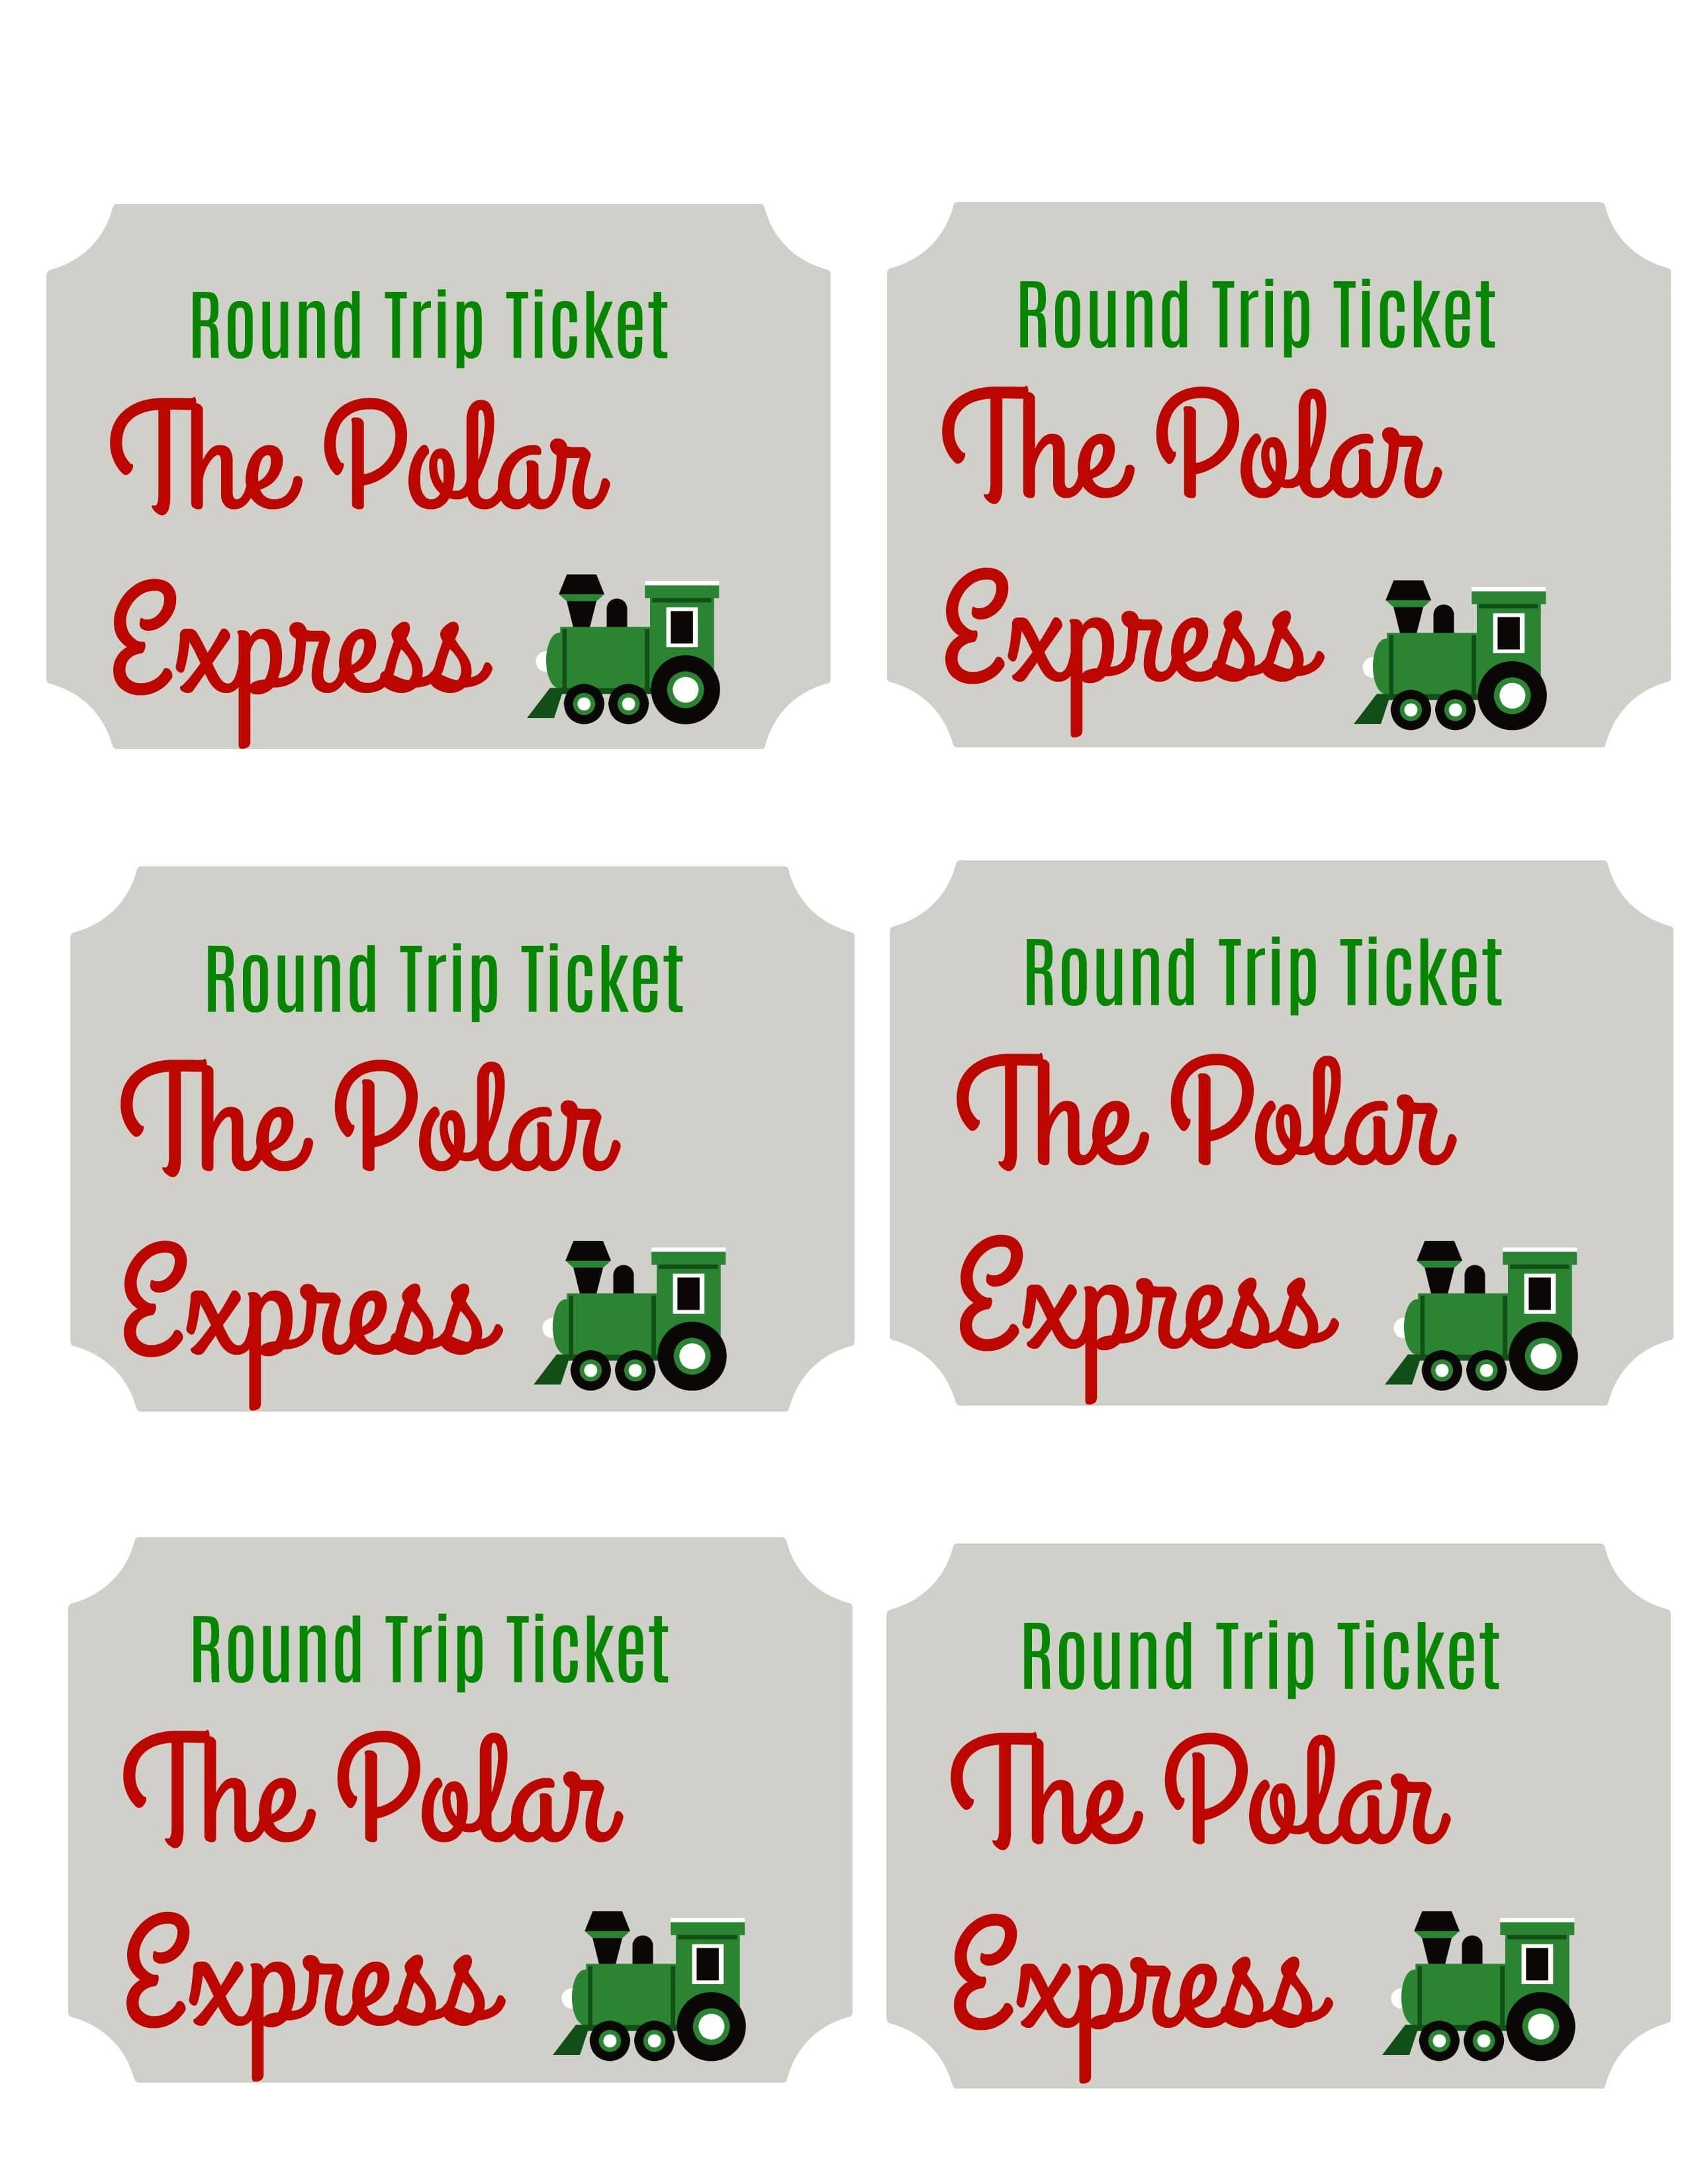 How To Host A Polar Express Party For Kids: Fun, Festive Ideas - Polar Express Free Printables